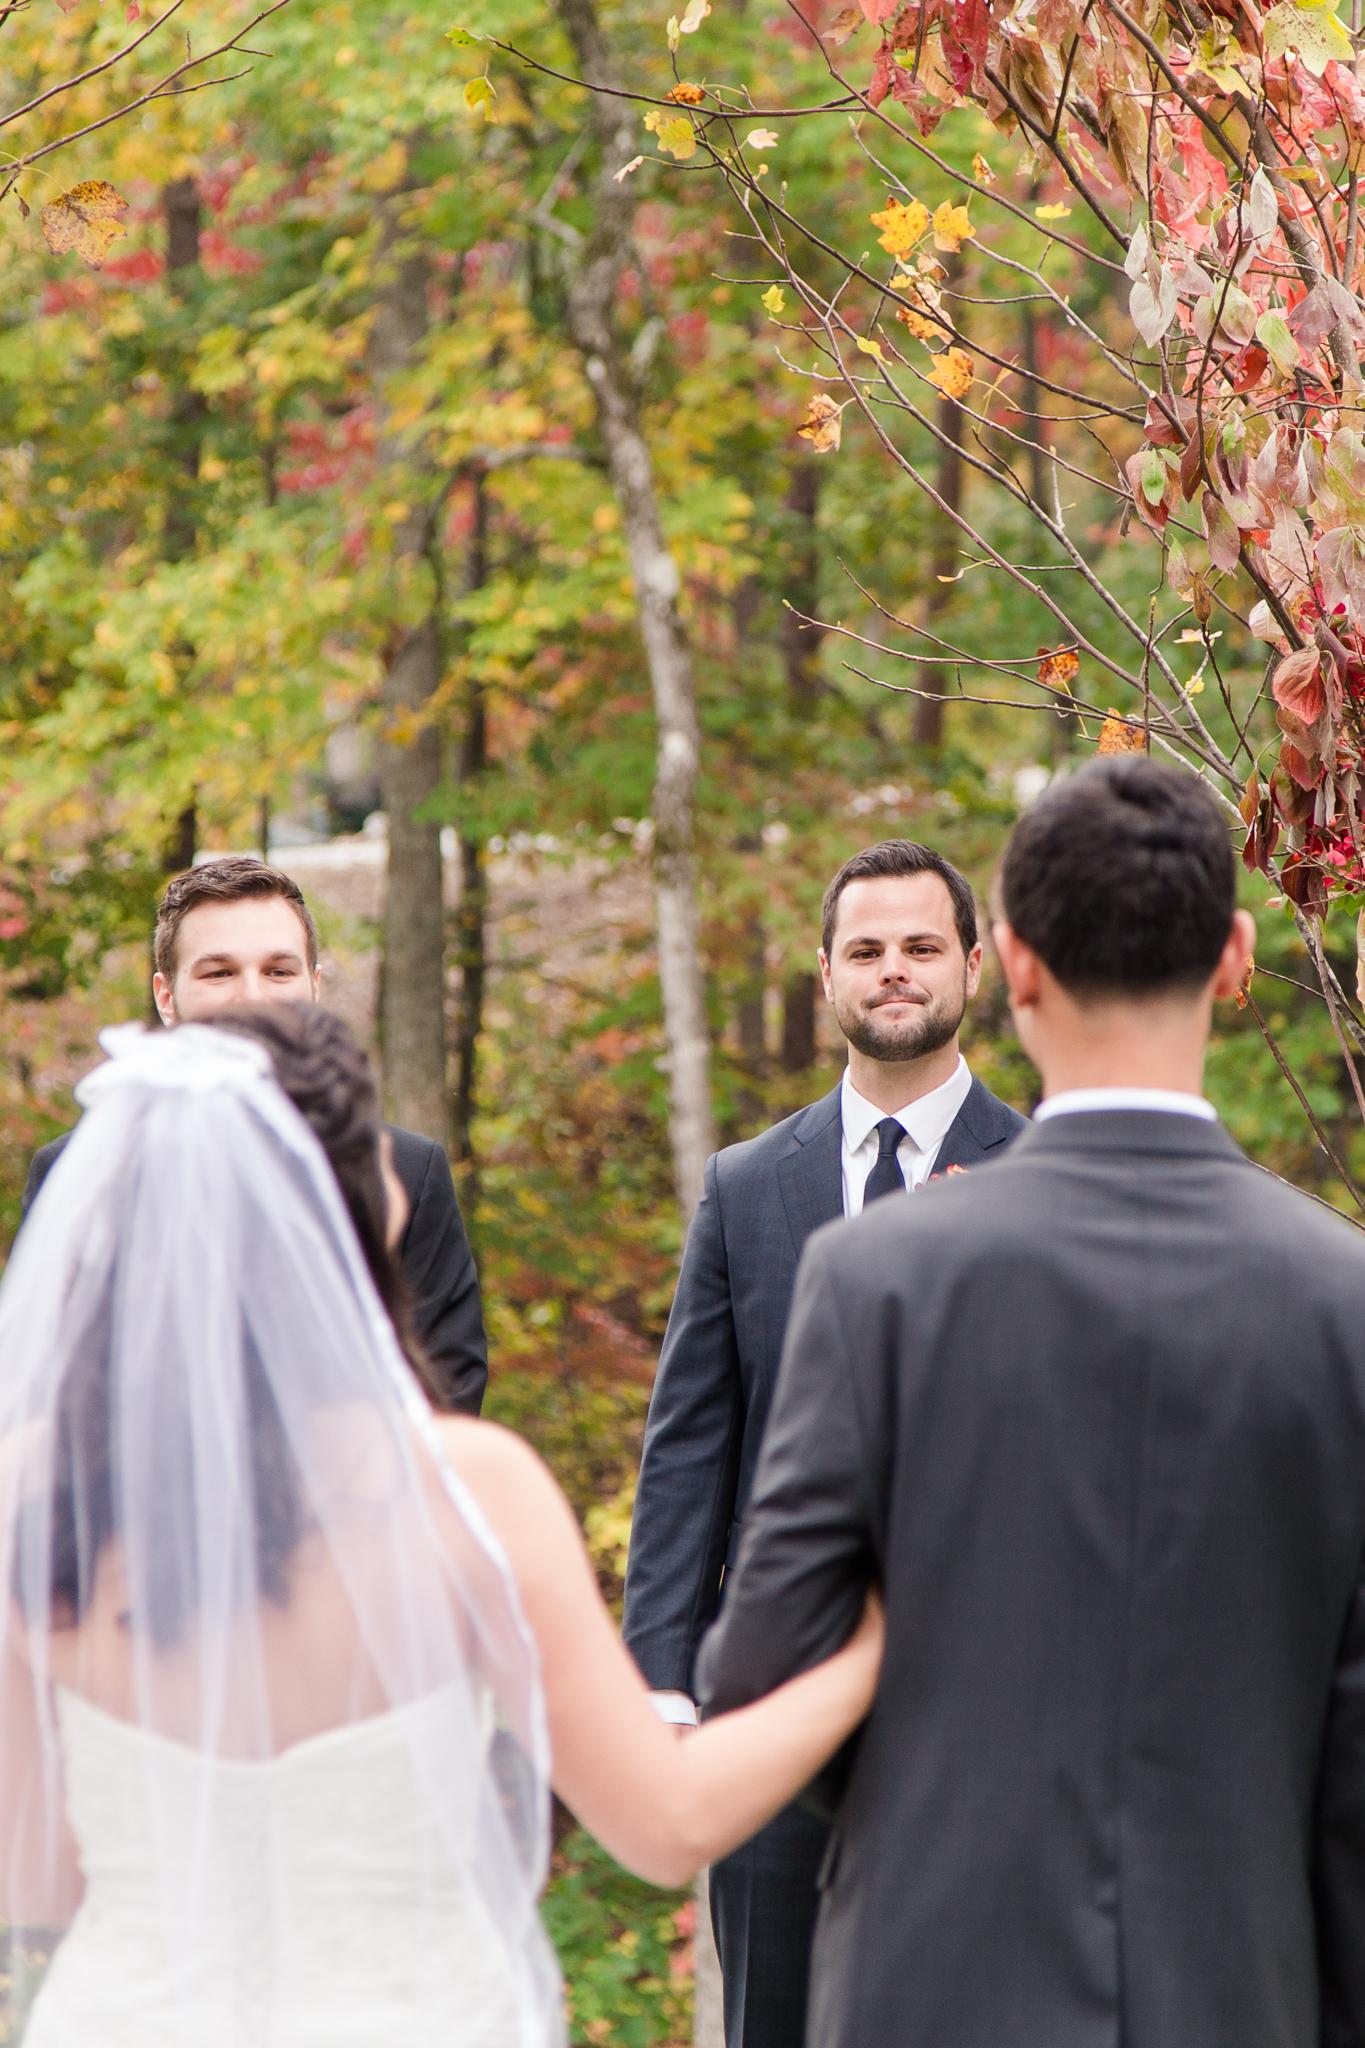 Ashley-Amber-Photo-Outdoor-Wedding-Photography-163839.jpg